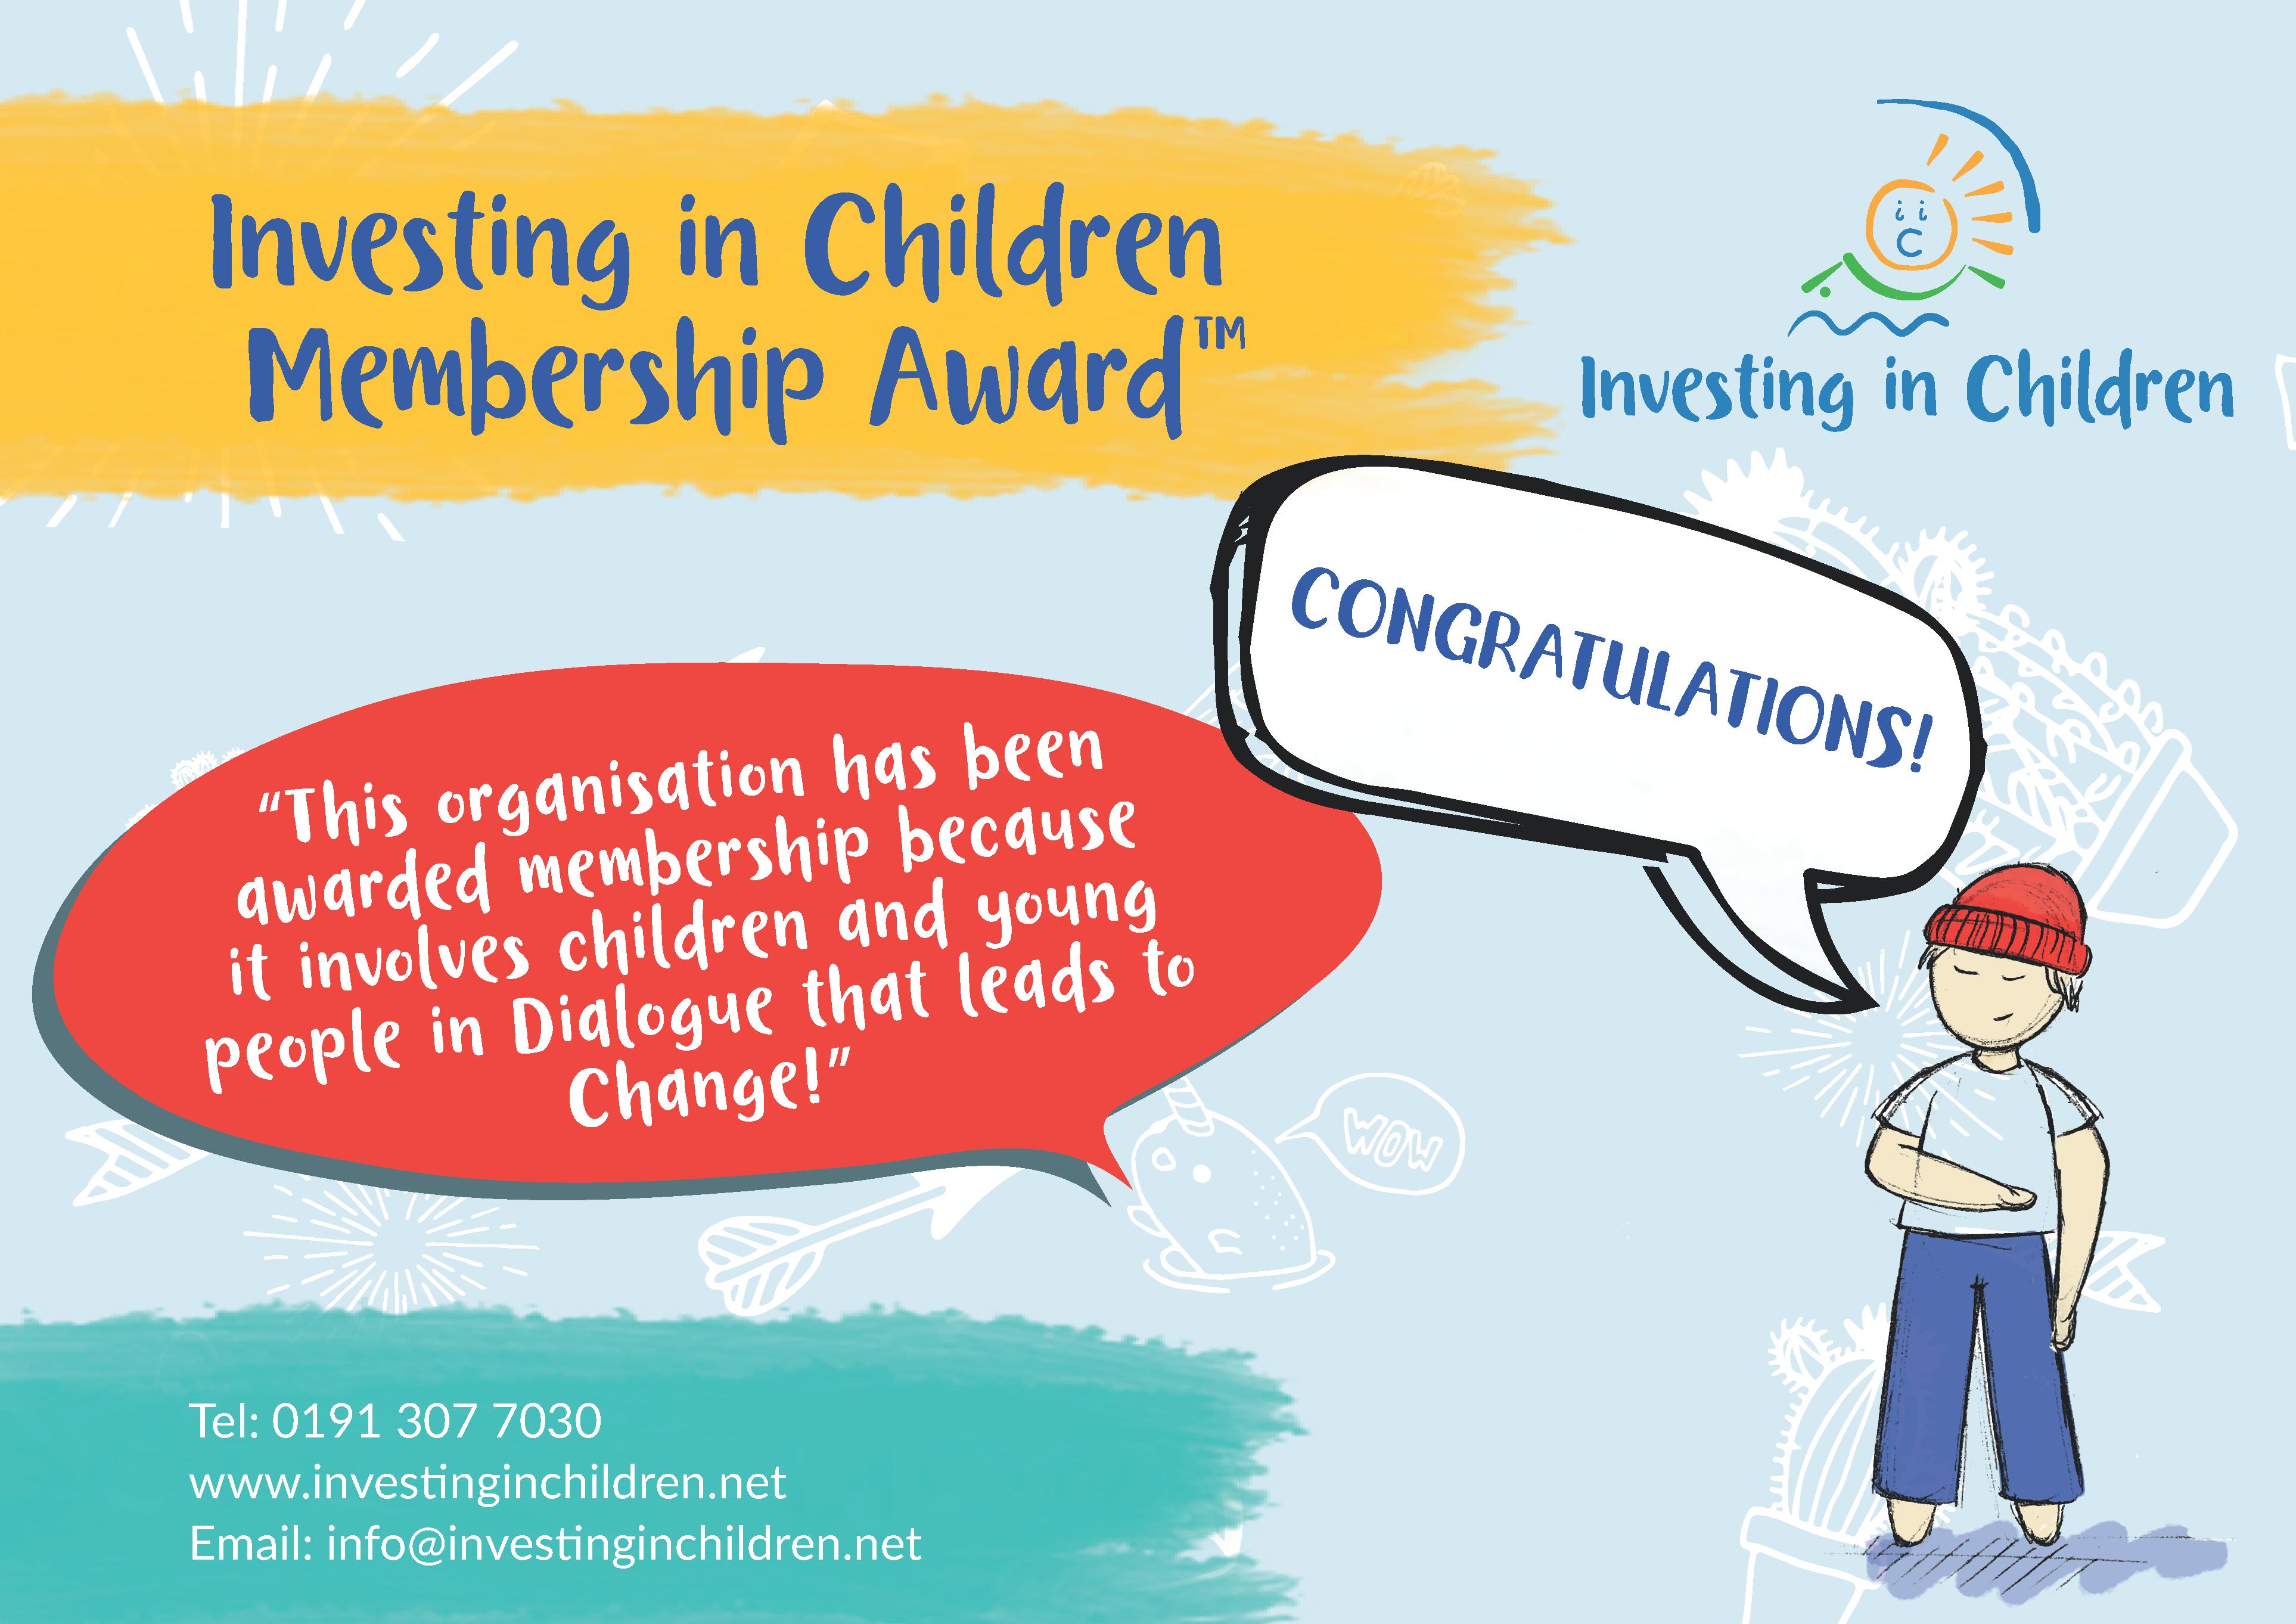 IiC membership award poster